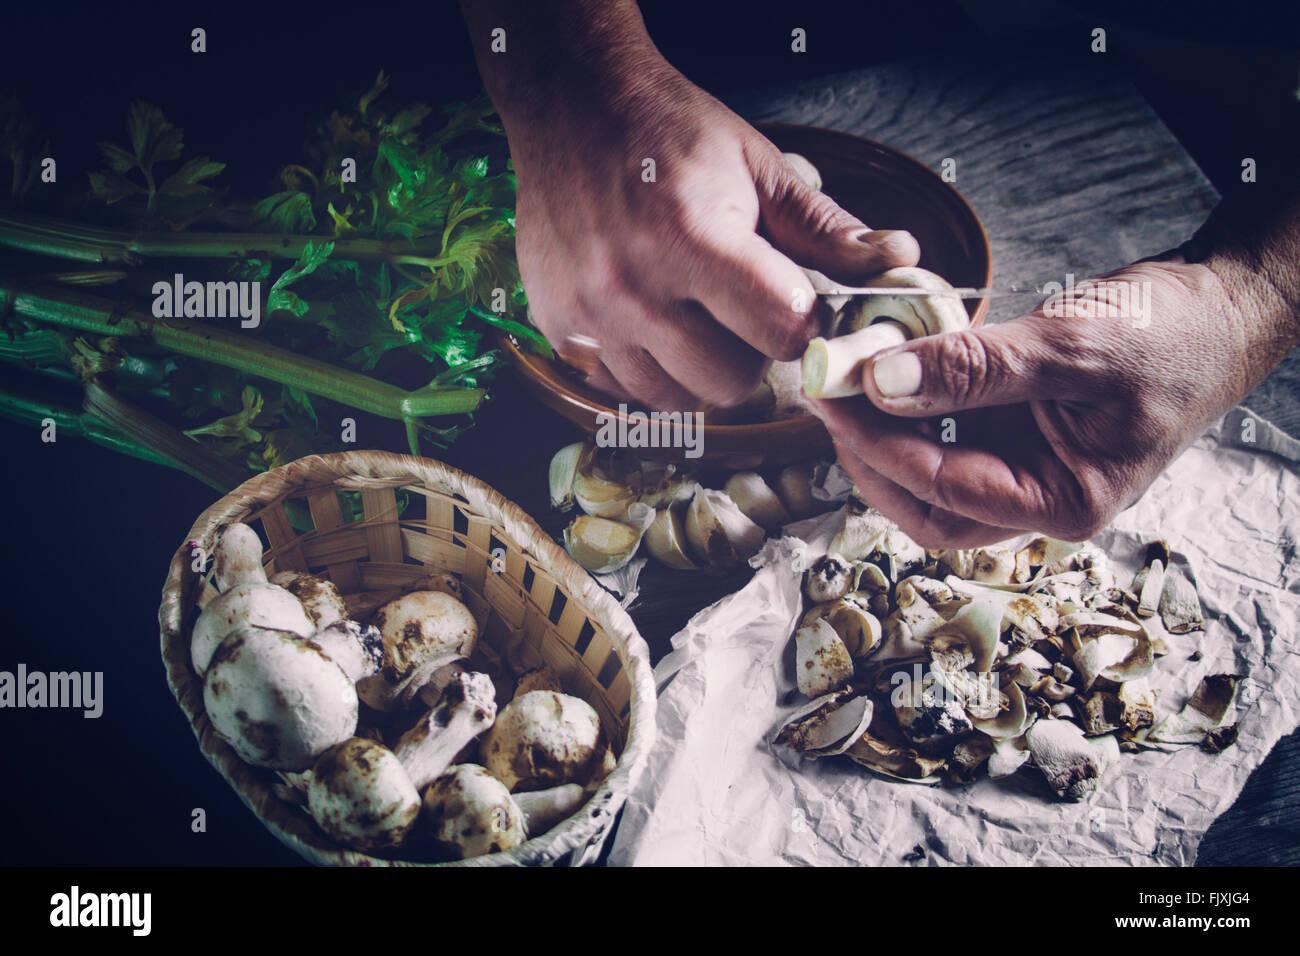 Cropped Image Of Chef Peeling Mushroom On Table Stock Photo